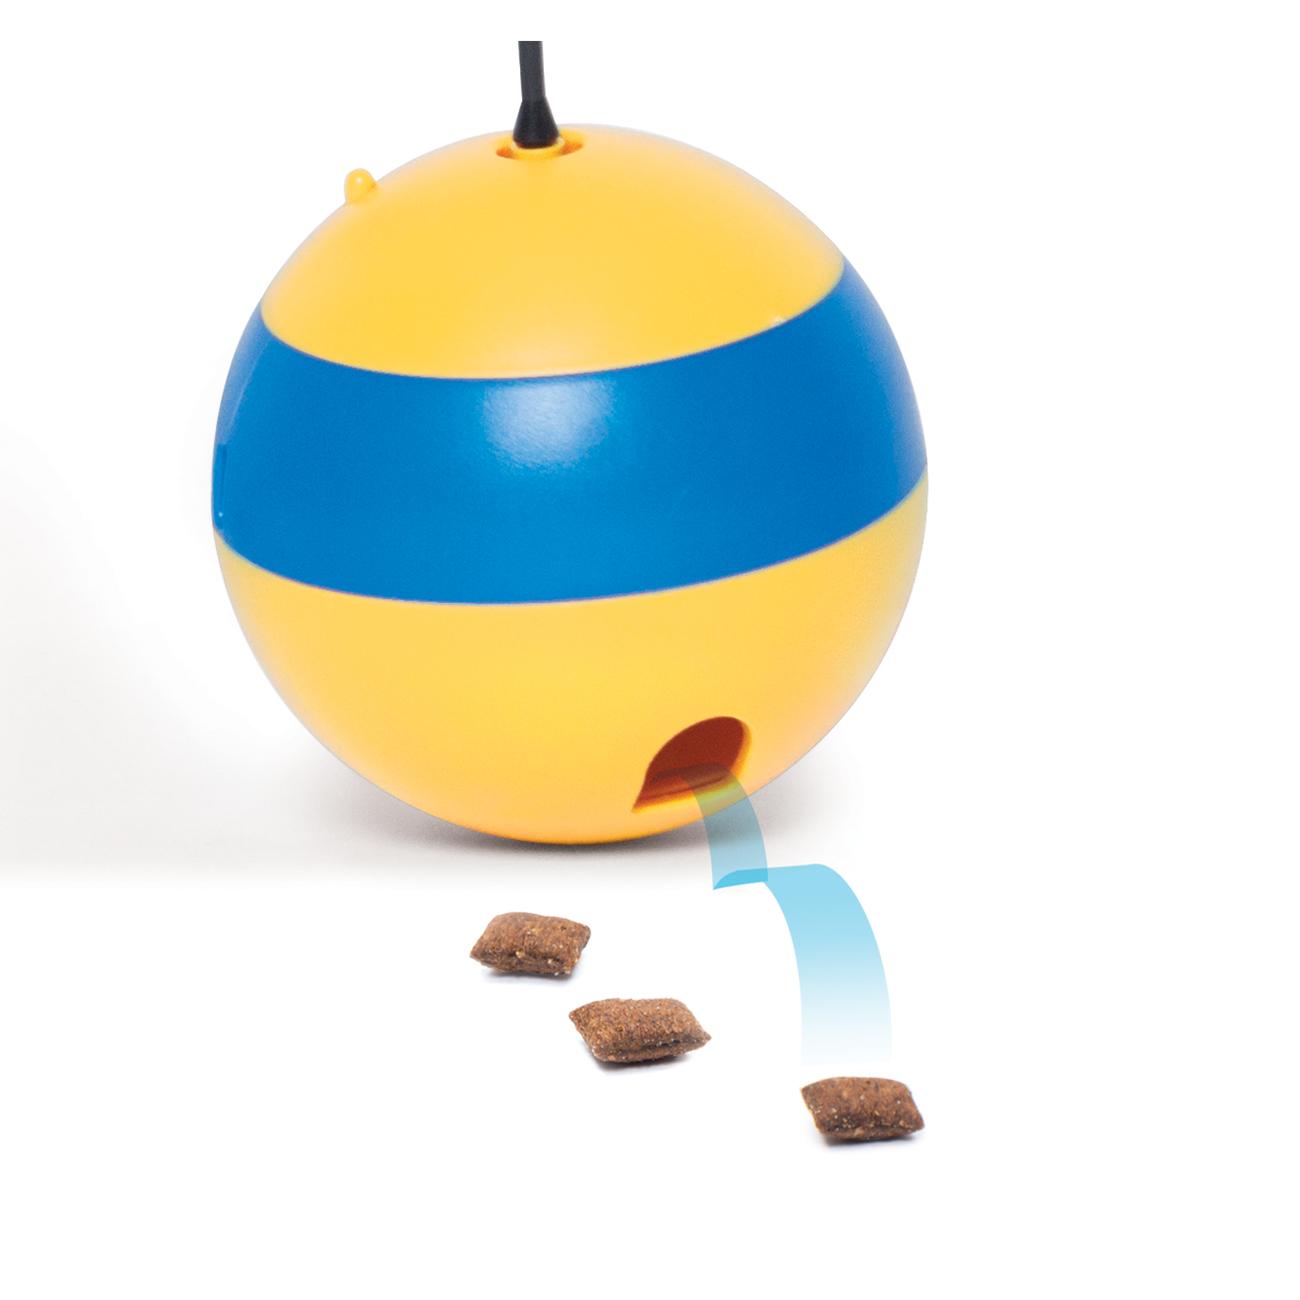 Catit Play 2.0 Tumbler Bee Laserspielzeug, Bild 5